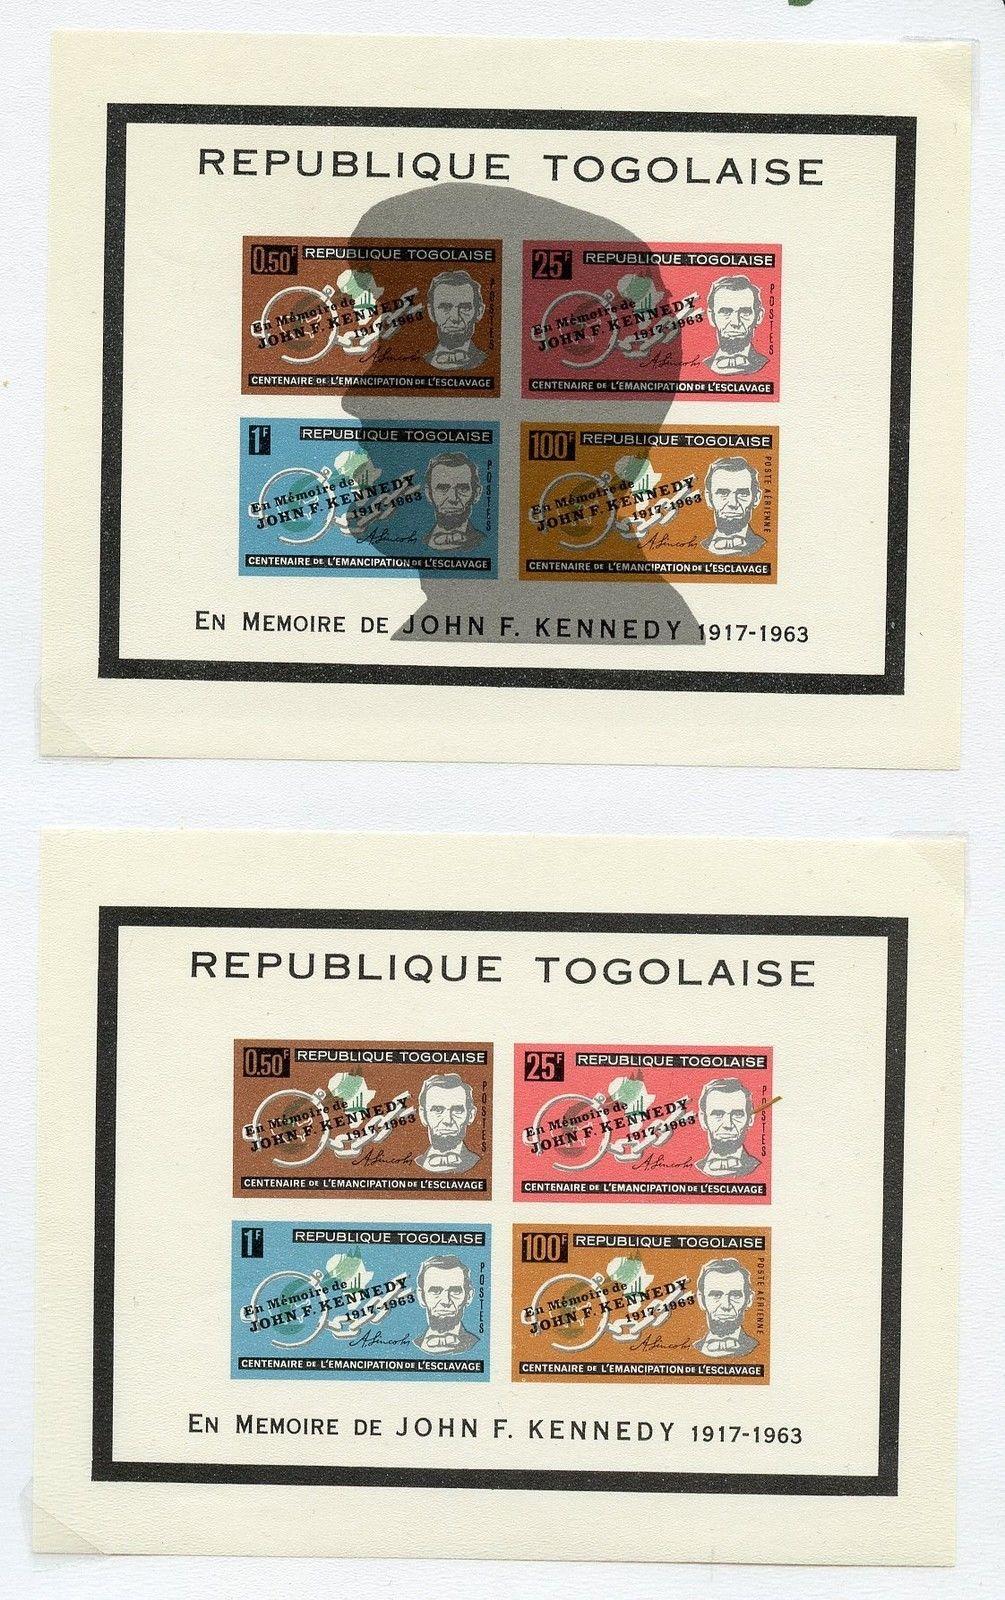 Togo John Kennedy Memorial Stamps Perf Mint Hipstamp Jpg 1005x1600 1963 Stamp Value